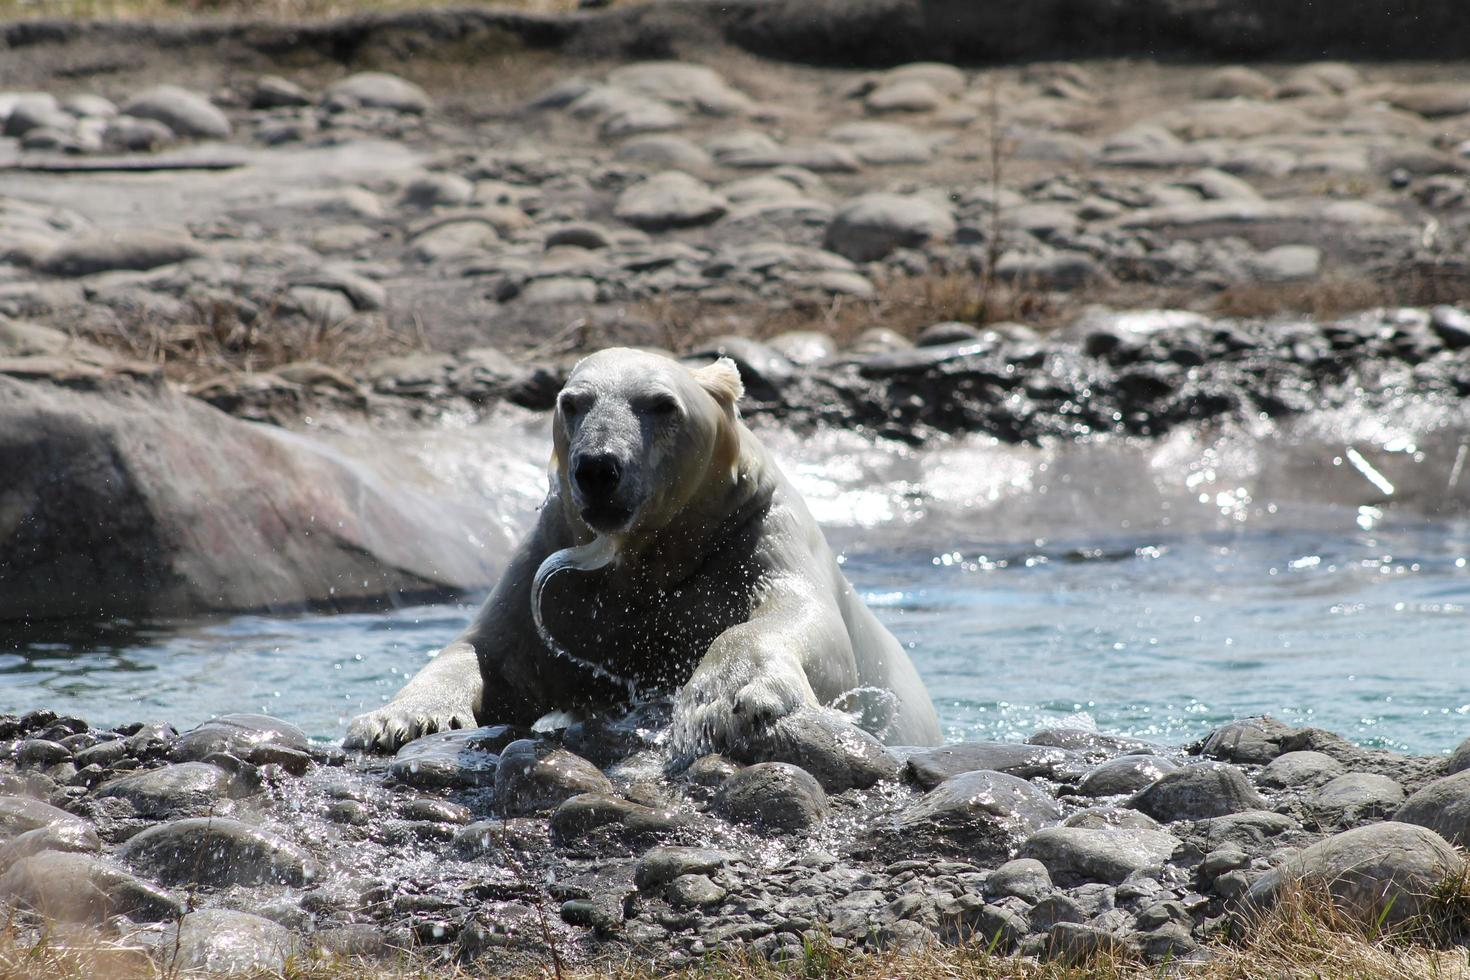 Polar bear swimming in the water photo